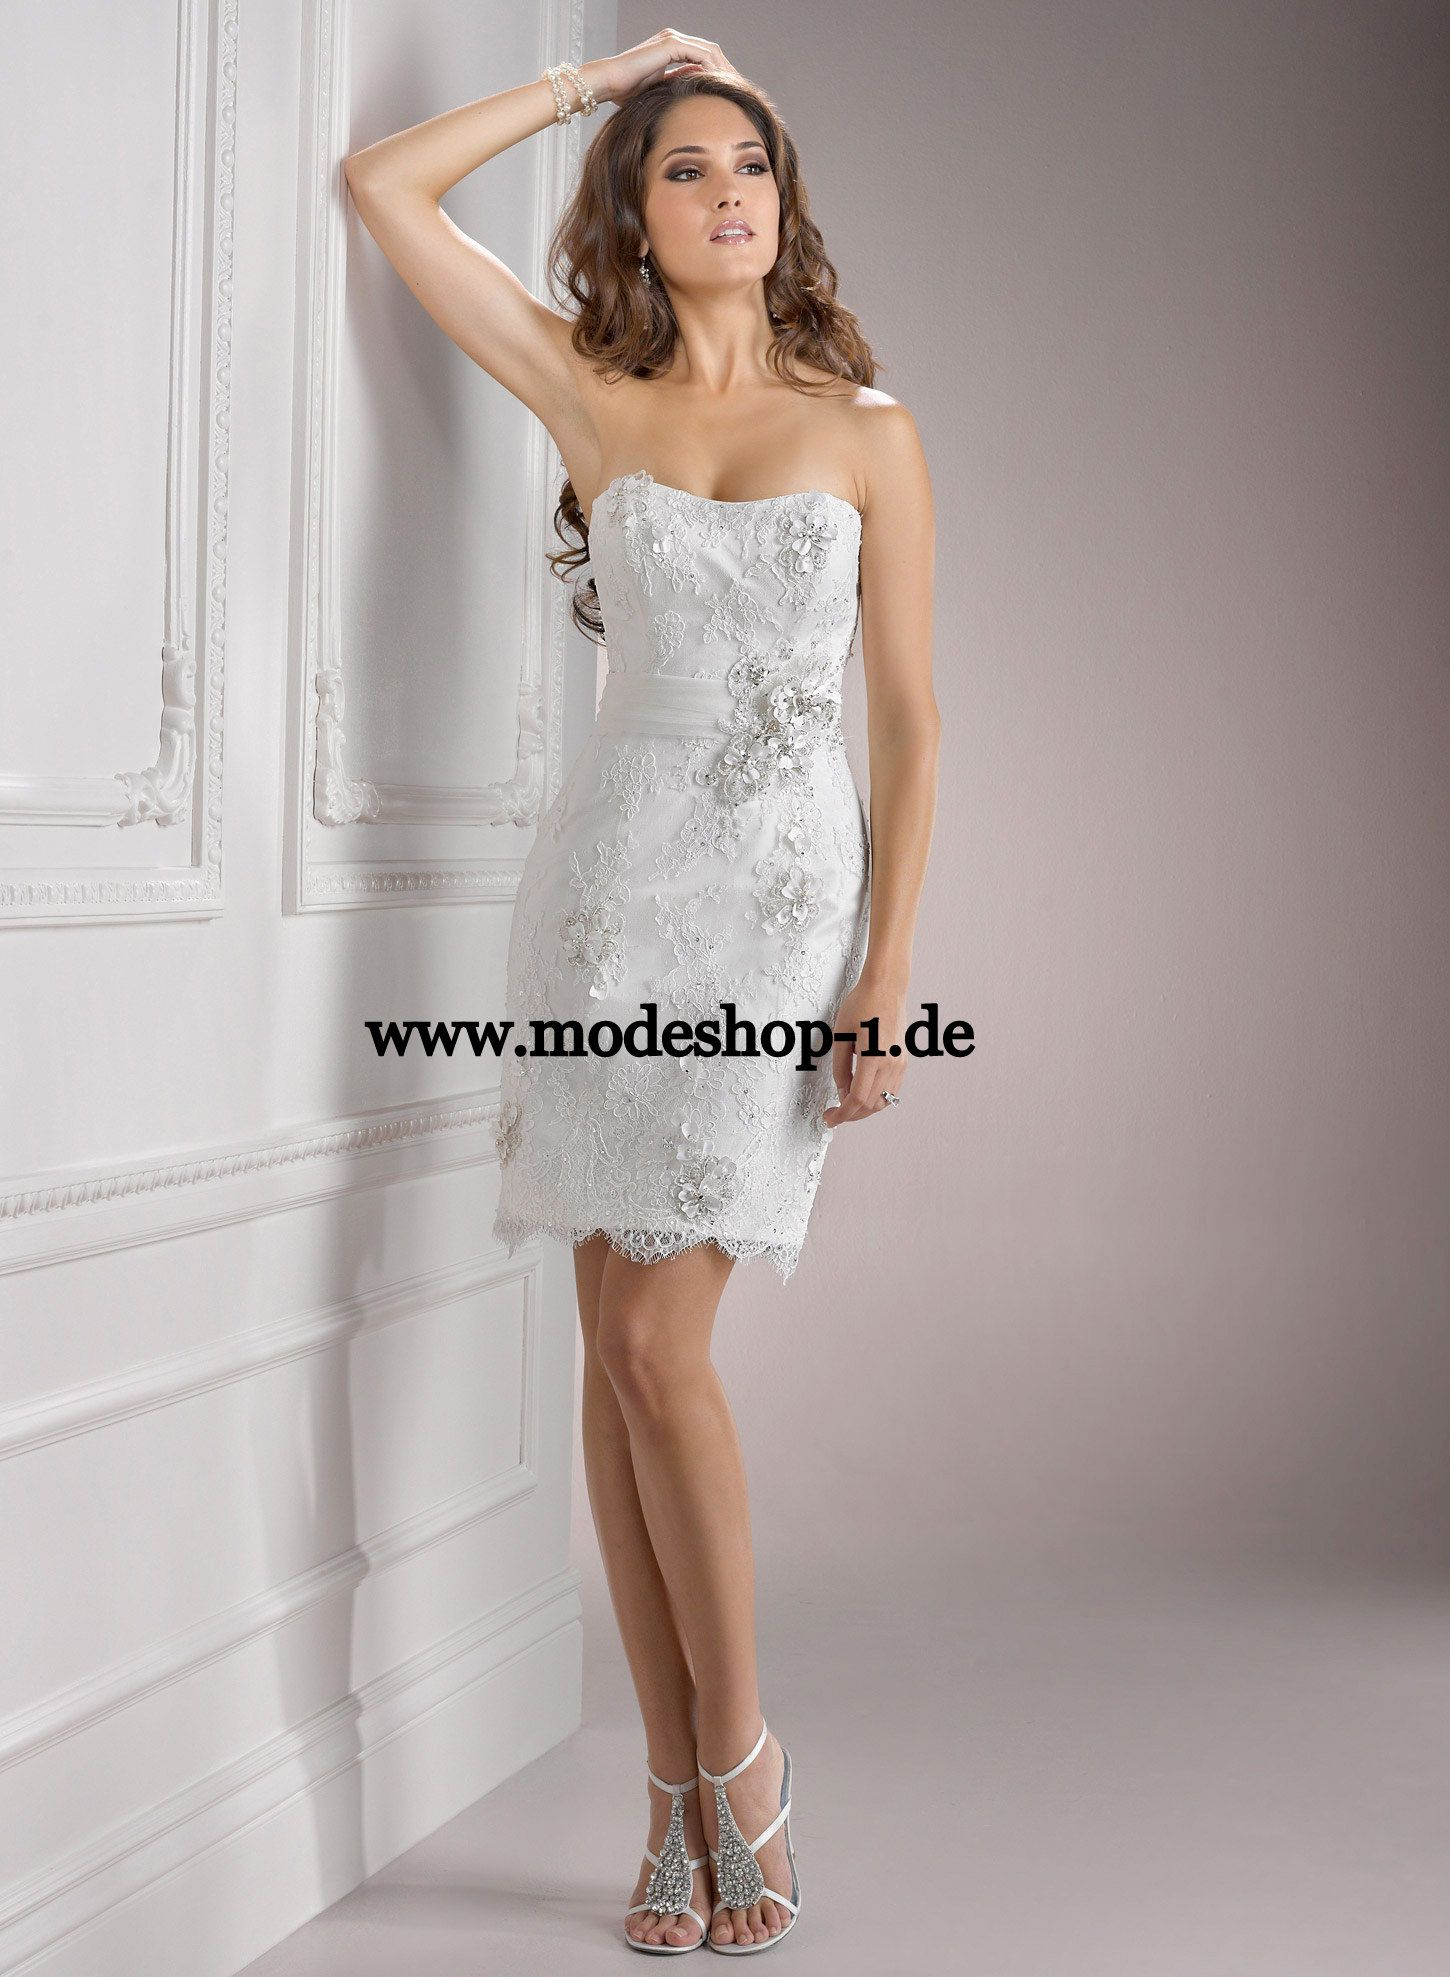 Braut Mode Brautkleid Kurz Sokotra www.modeshop-1.de | BRIDAL ...